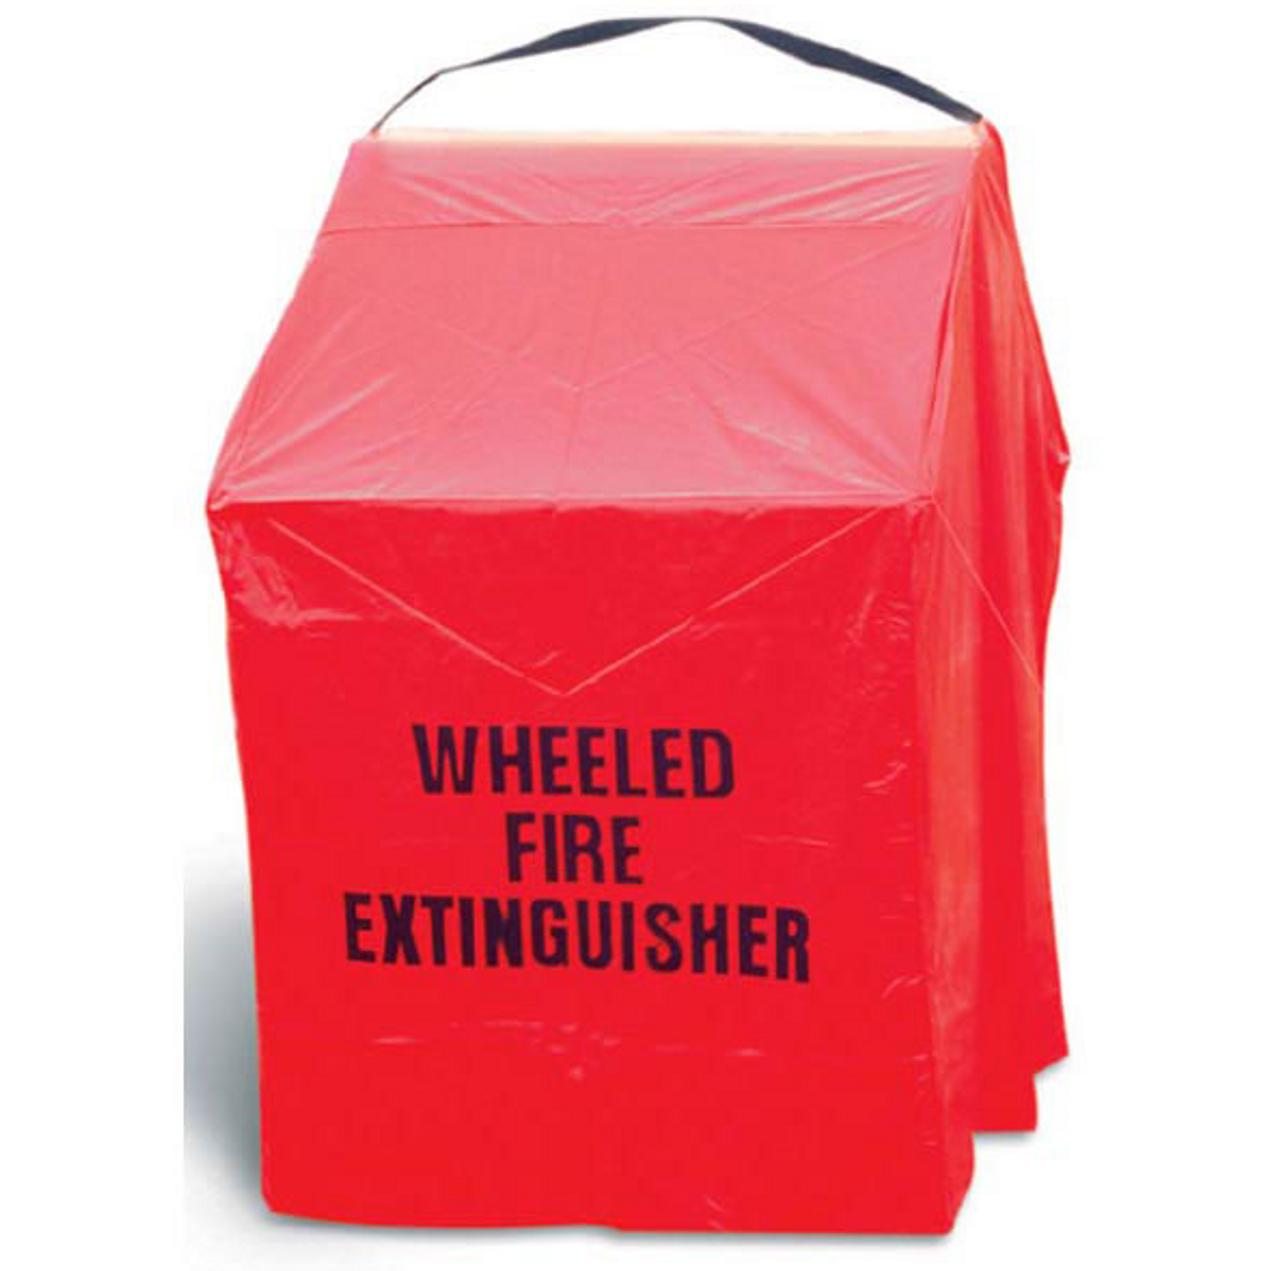 WUC1 - 150 lb Vinyl Wheeled Fire Extinguisher Cover